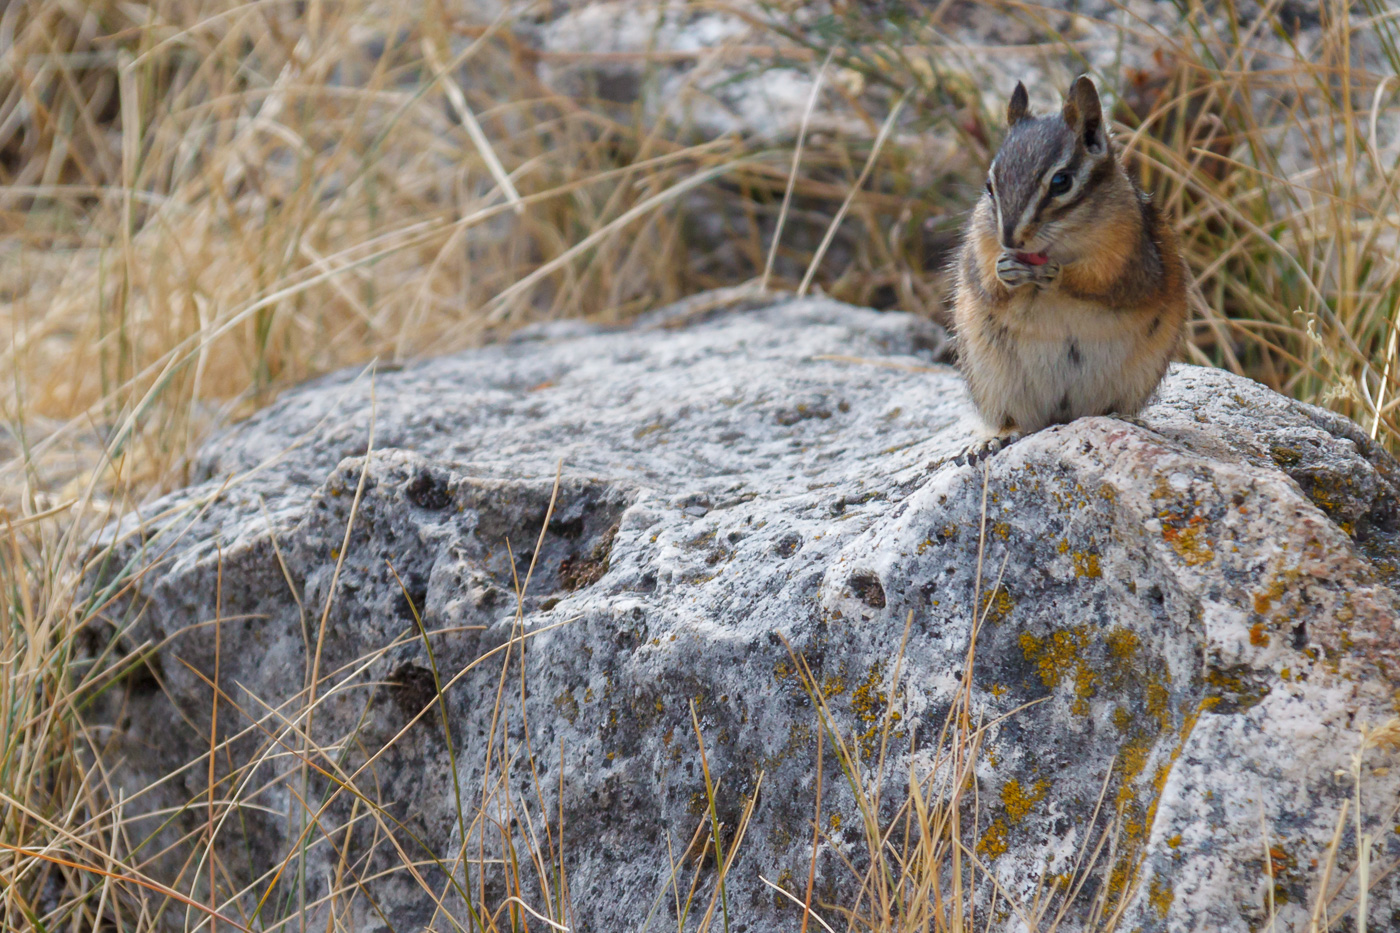 Uinta chipmunk (Neotamias umbrinus), Yellowstone National Park, U.S.A. - Fauna de Nord-Amèrica - Raül Carmona - Fotografia, Fotografia d'estudi, esdeveniments i Natura